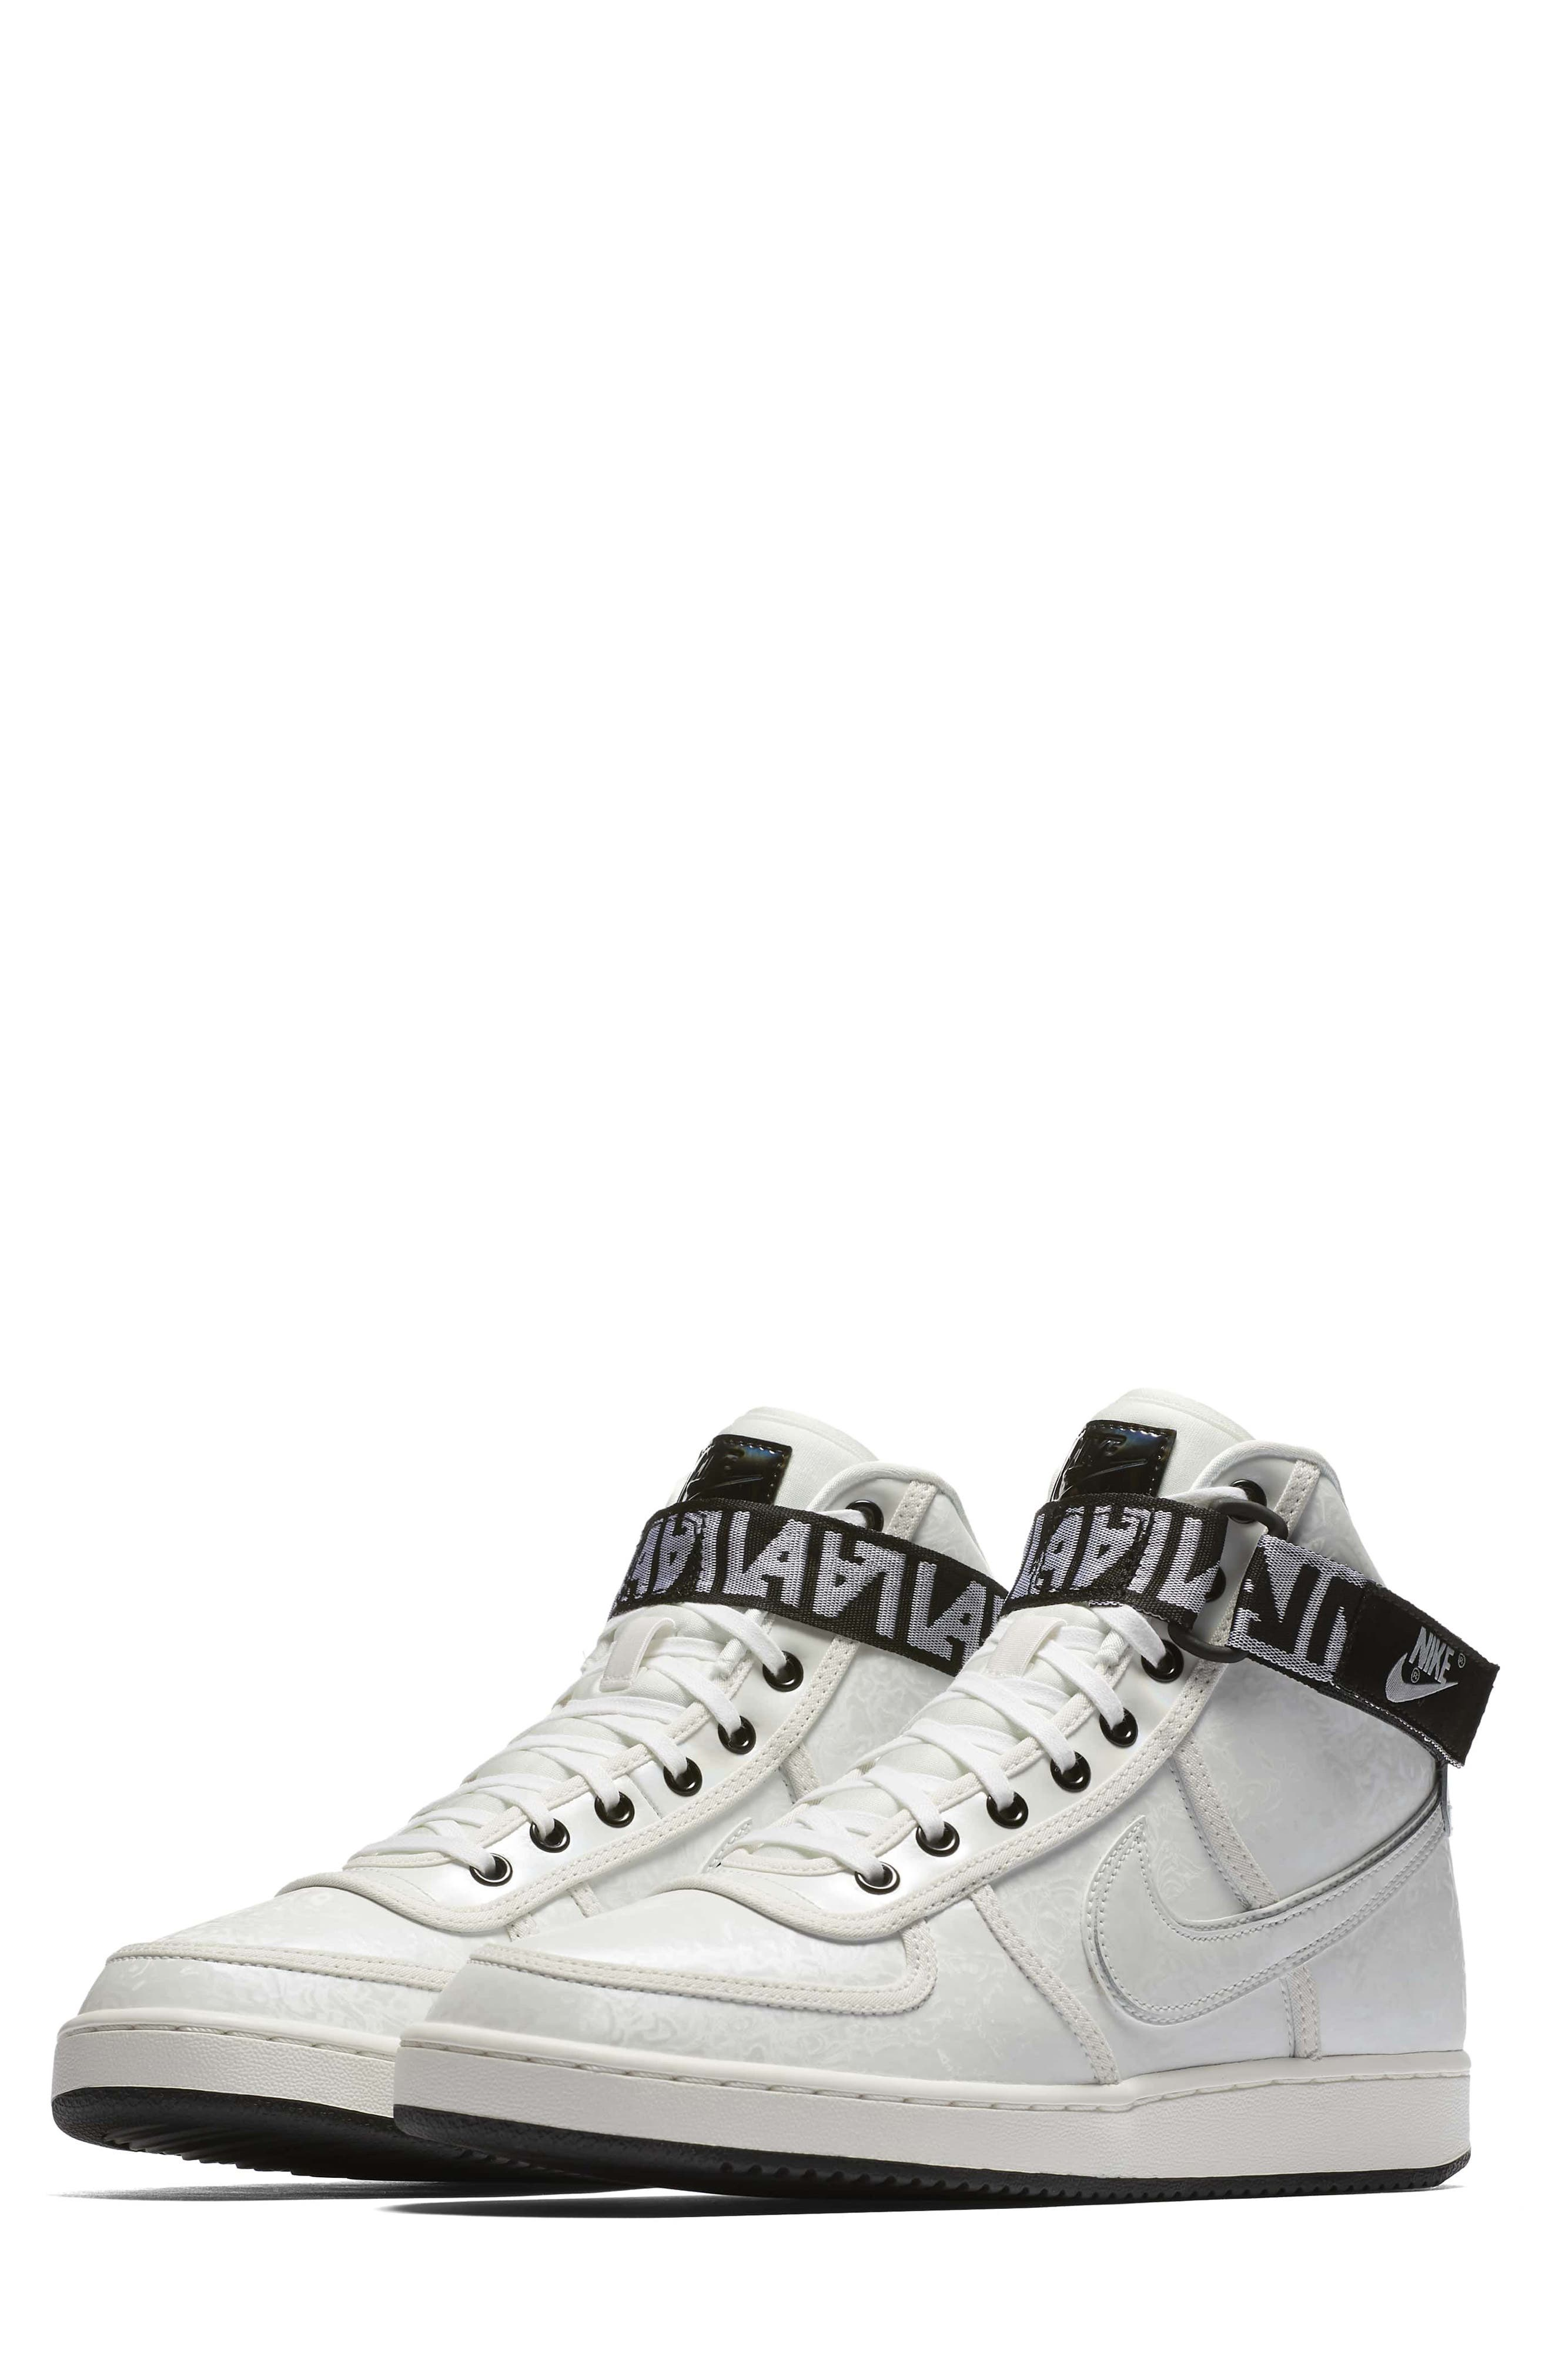 Nike Vandal High Lux Negro Zapatilla Blanco  Negro Lux Modesens Cumbre 879ed6